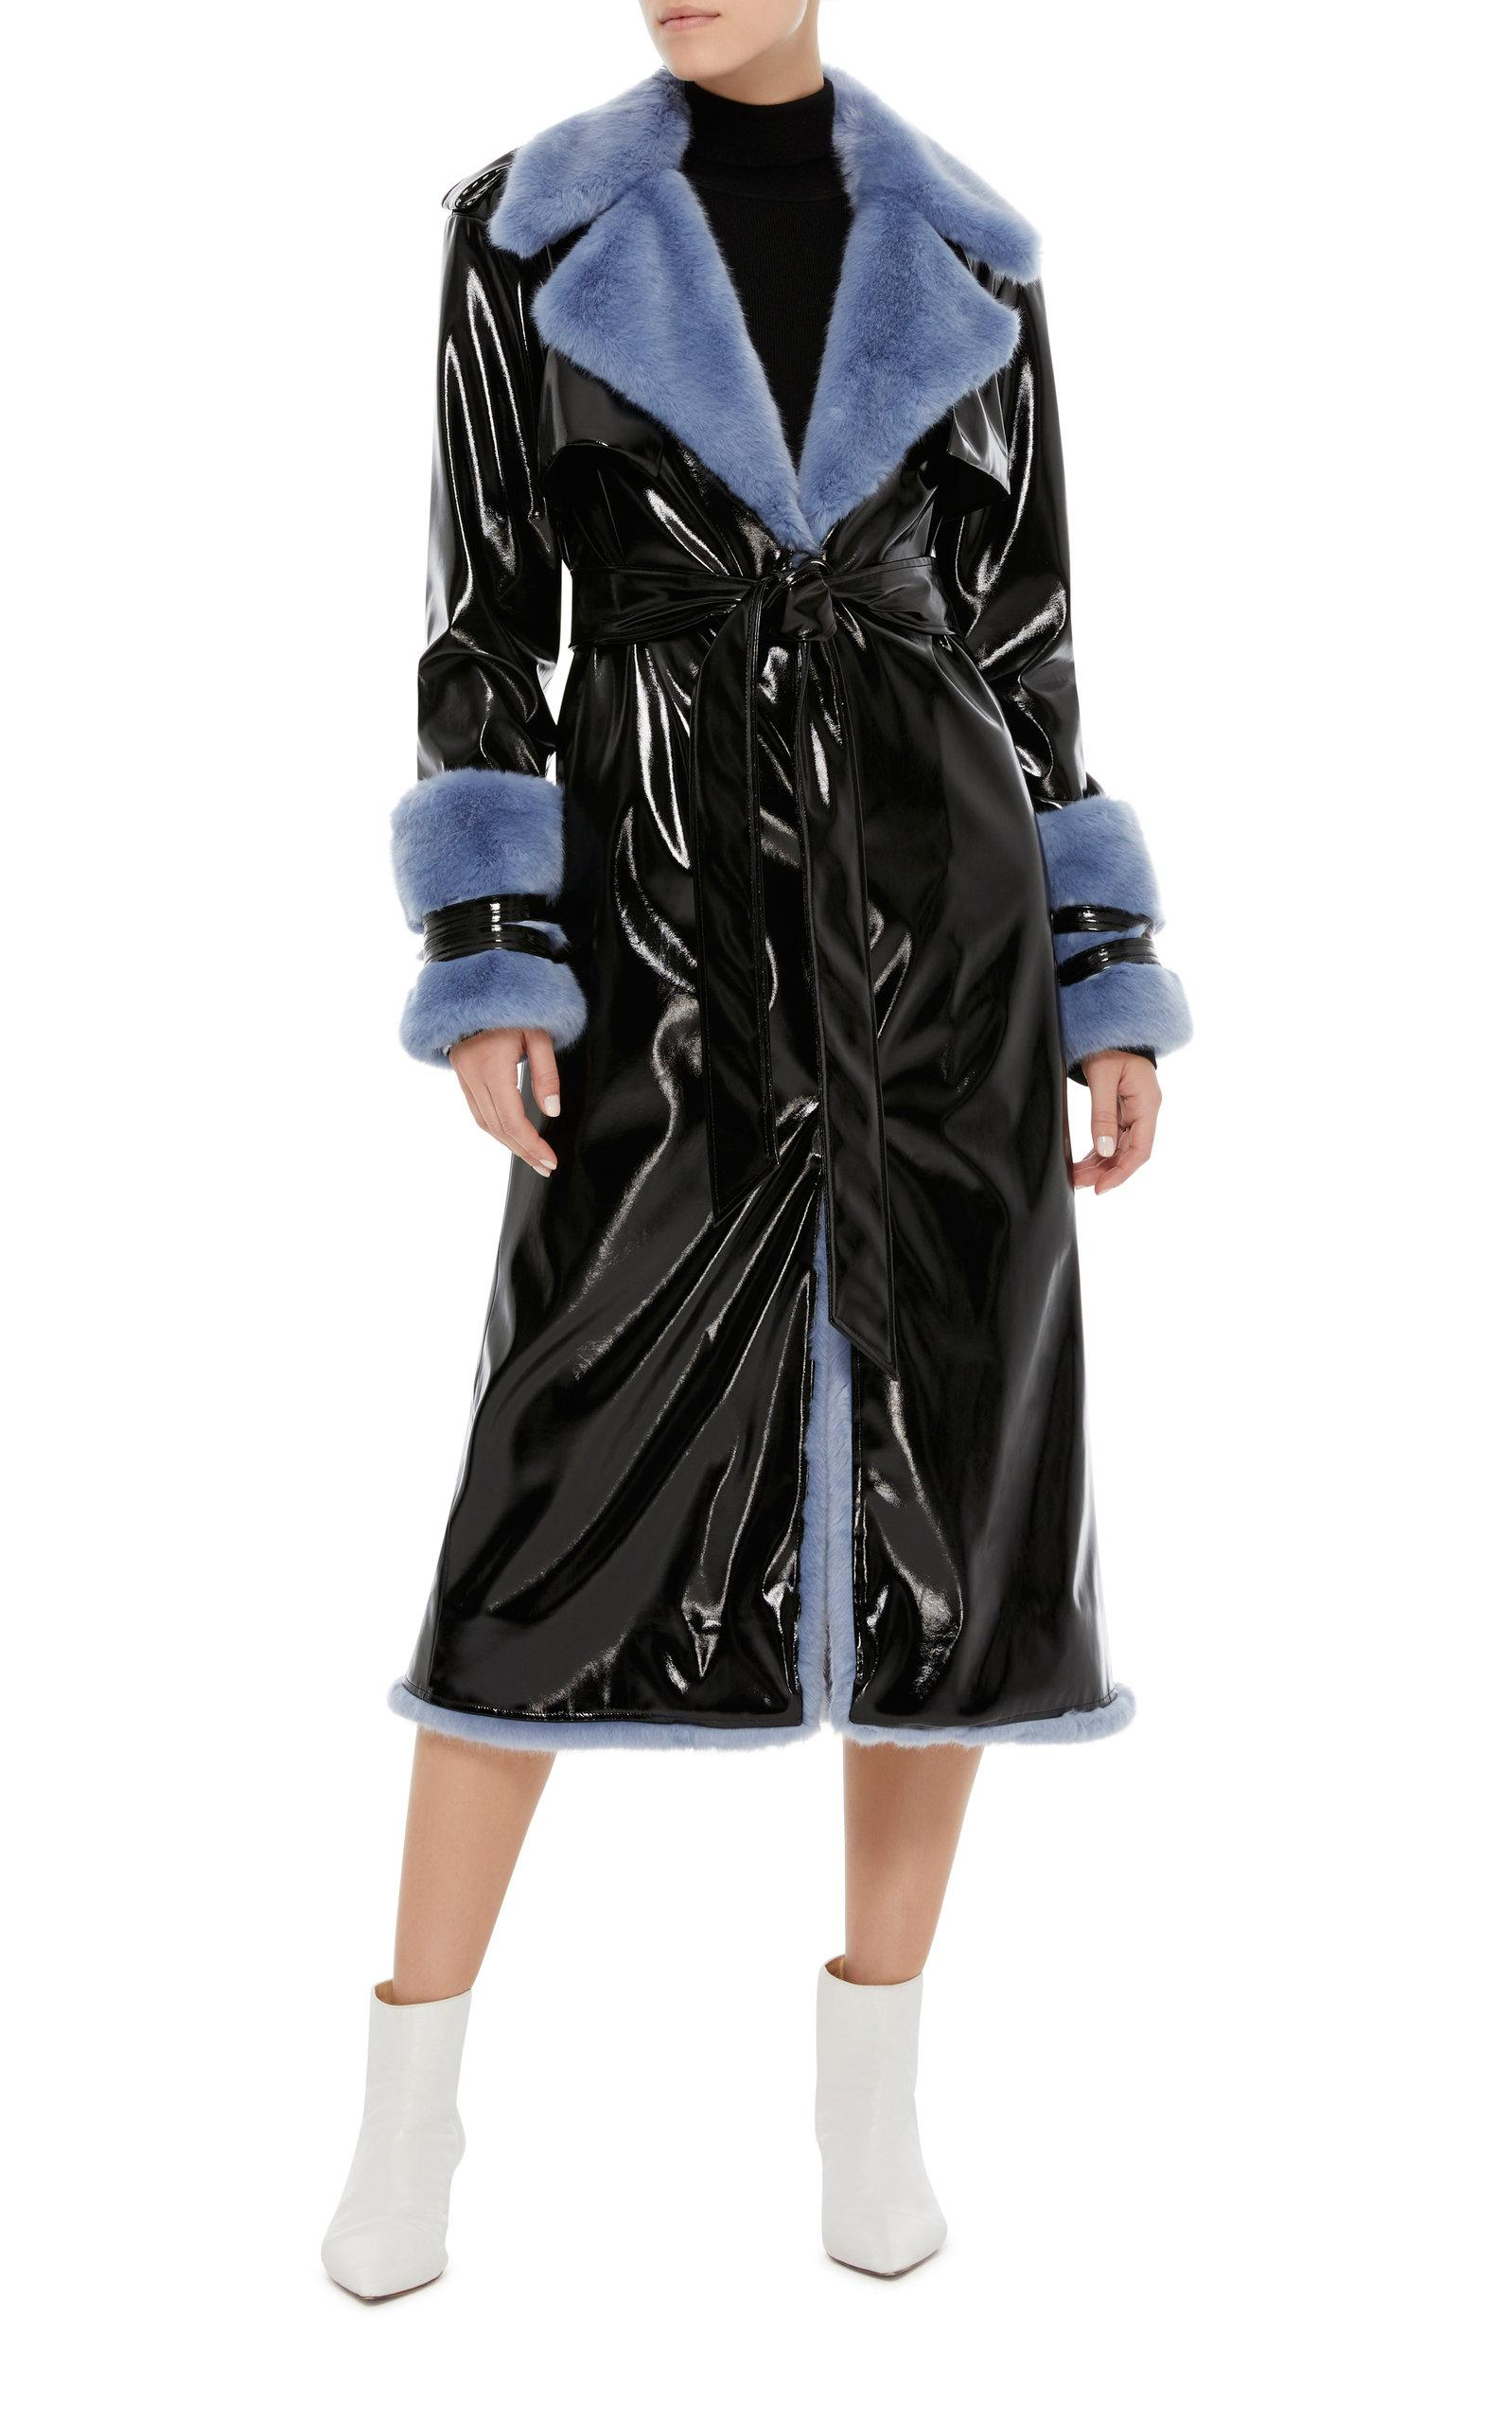 Sarina SARINA Ladies Trench Coat Leather TAN MID LEGTH CLASSIC REAL LEATHER